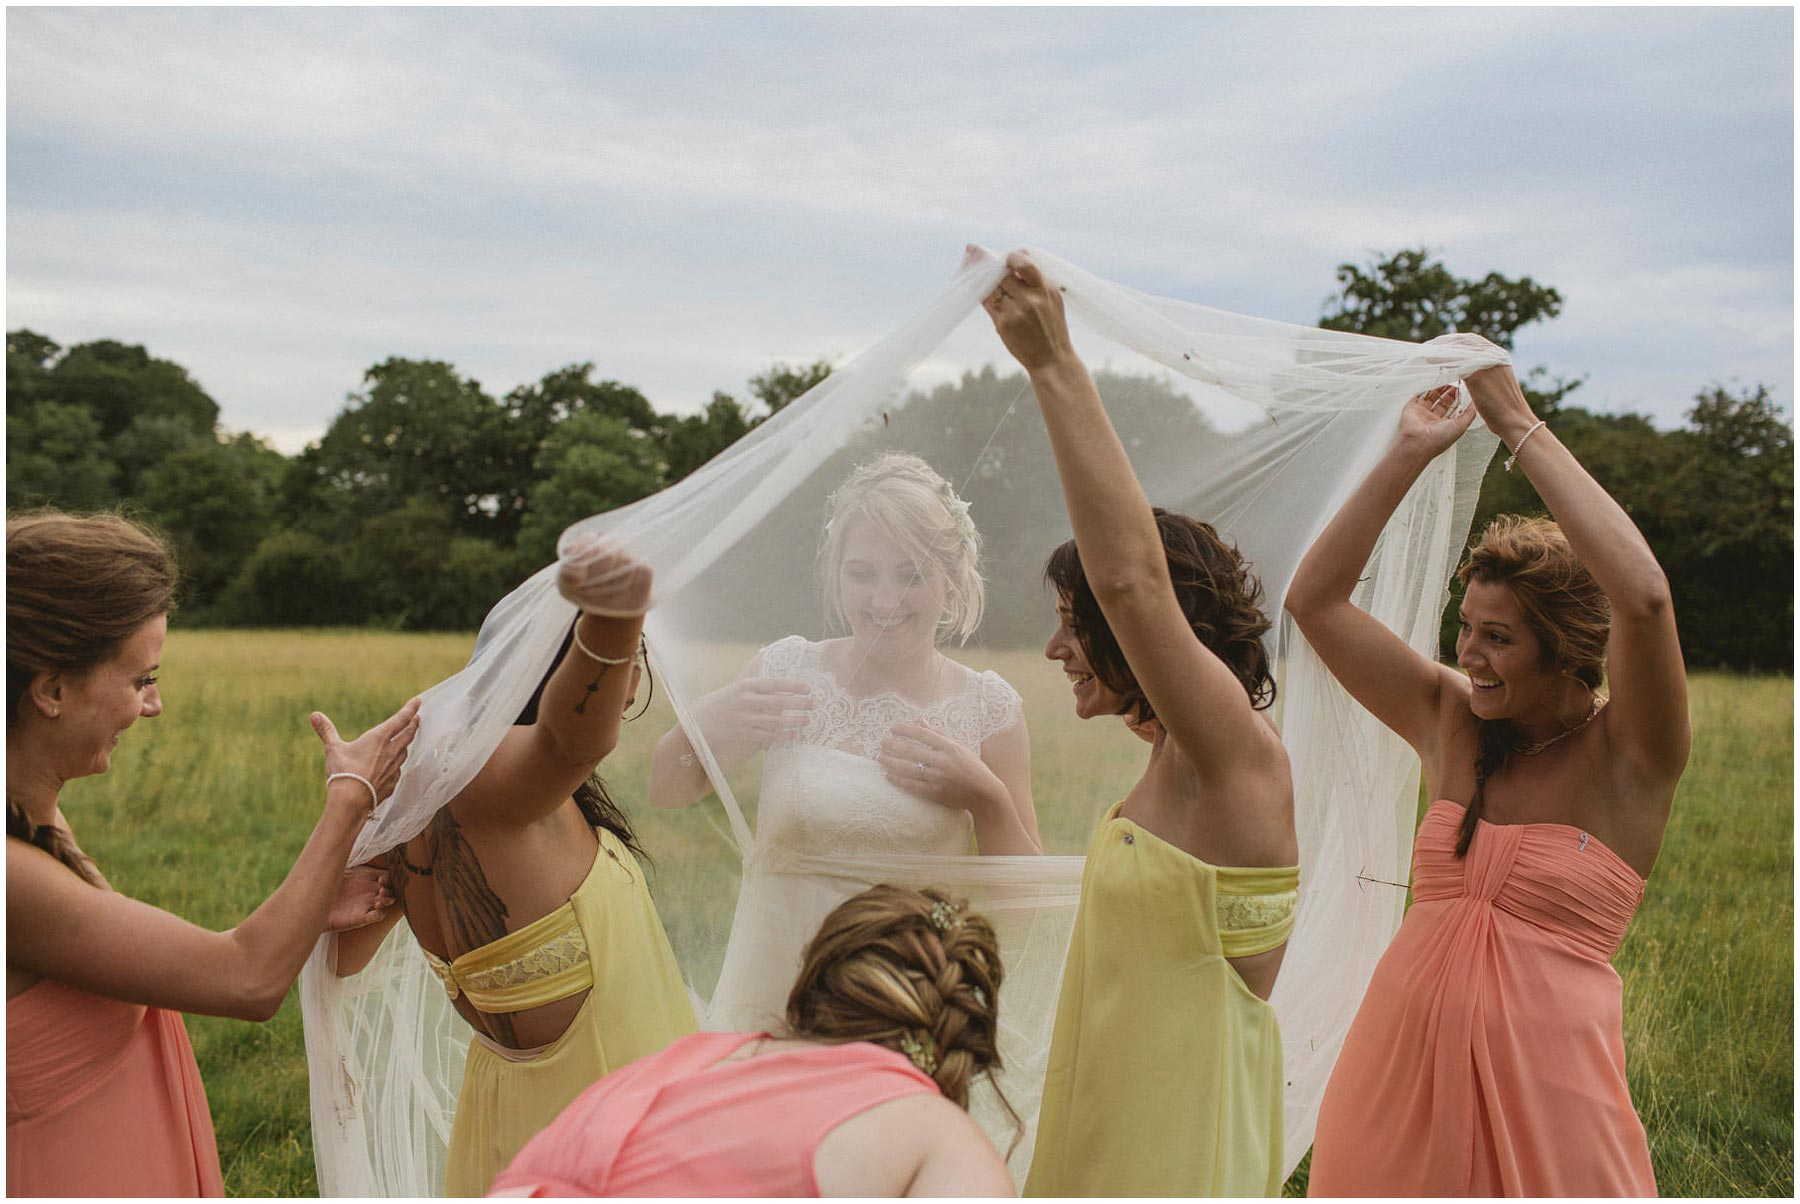 Kent-Festival-Tipi-wedding-photography_0155